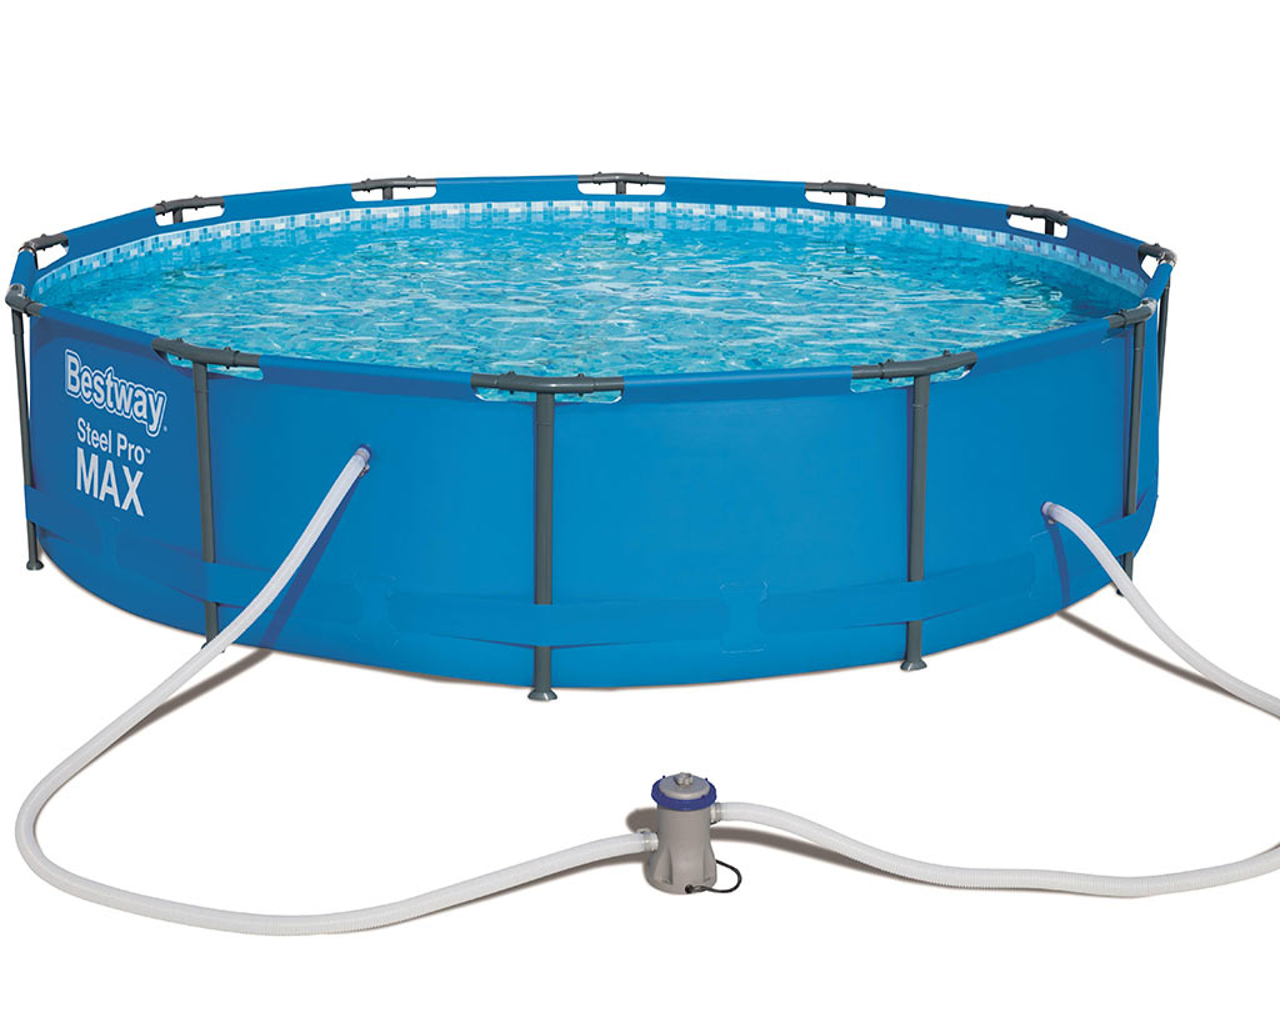 Kit piscine bestway steel pro max pool ronde 366 x 76cm filtration cartouche sur for Kit filtration piscine a debordement